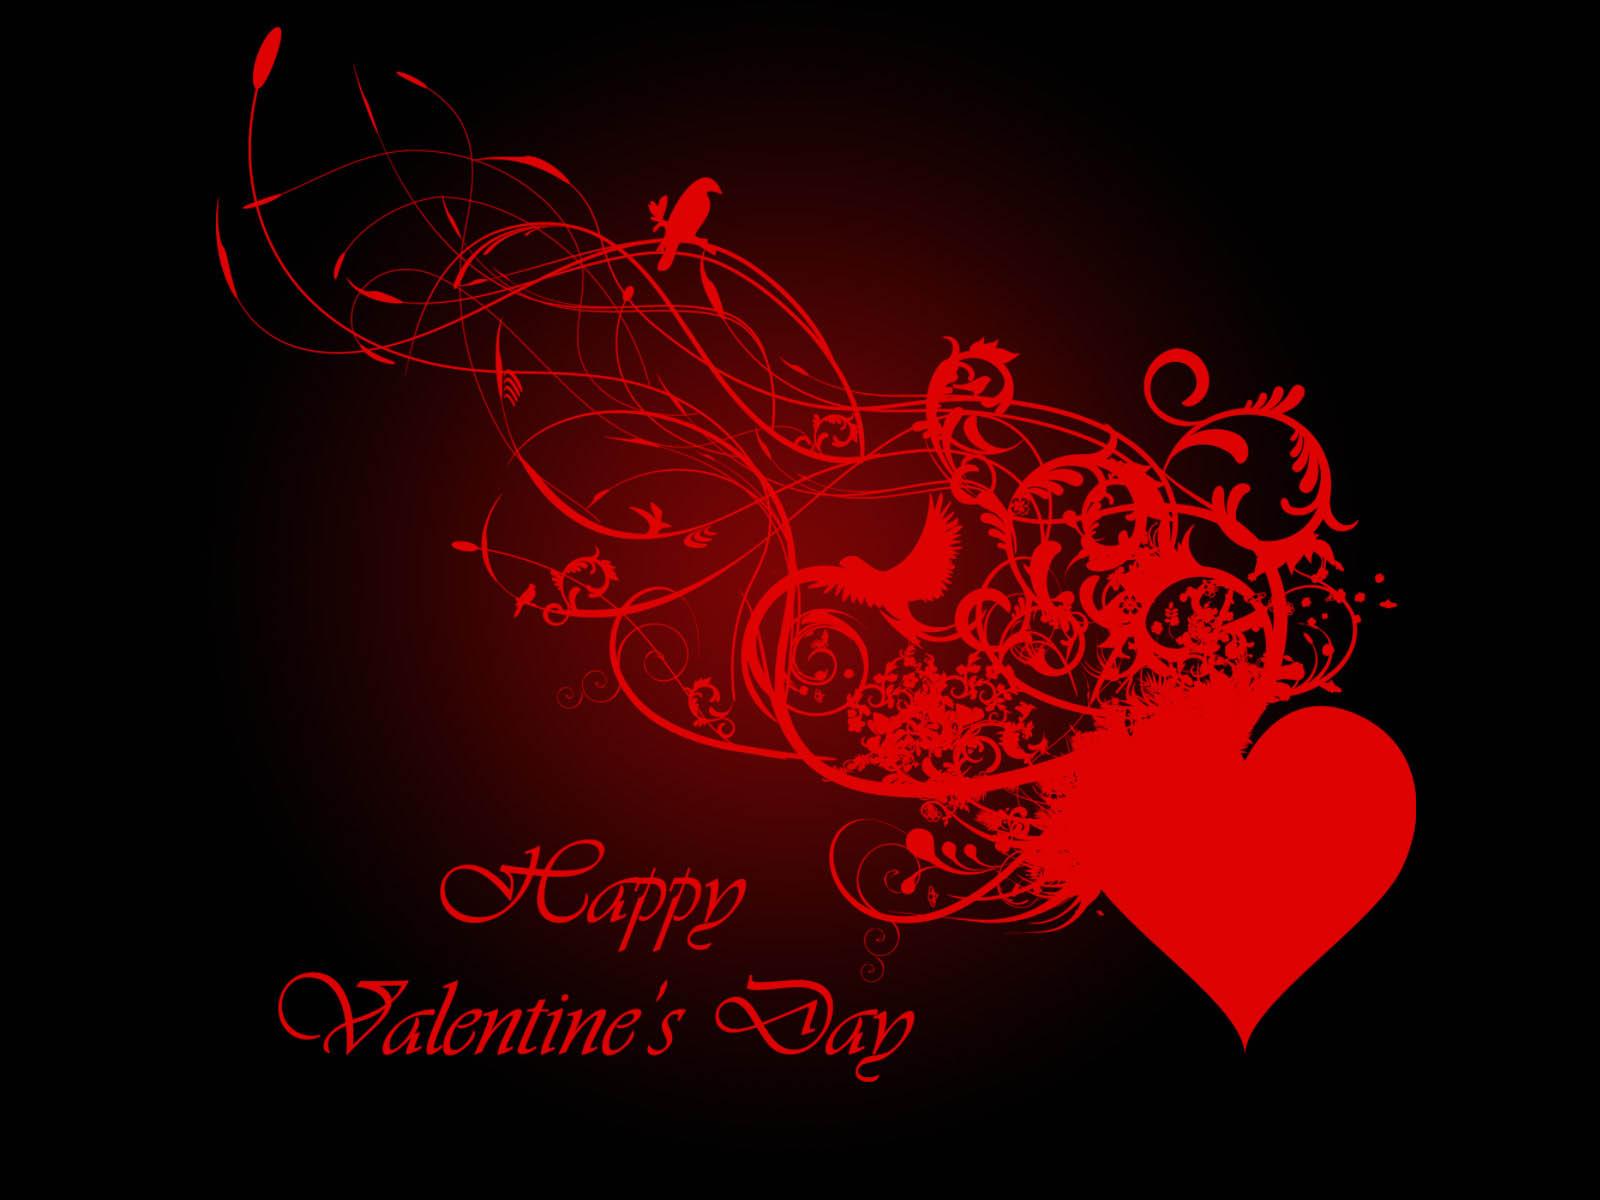 Happy Valentines Day Love Modern Hearts Latest 3d Hd Wallpaper